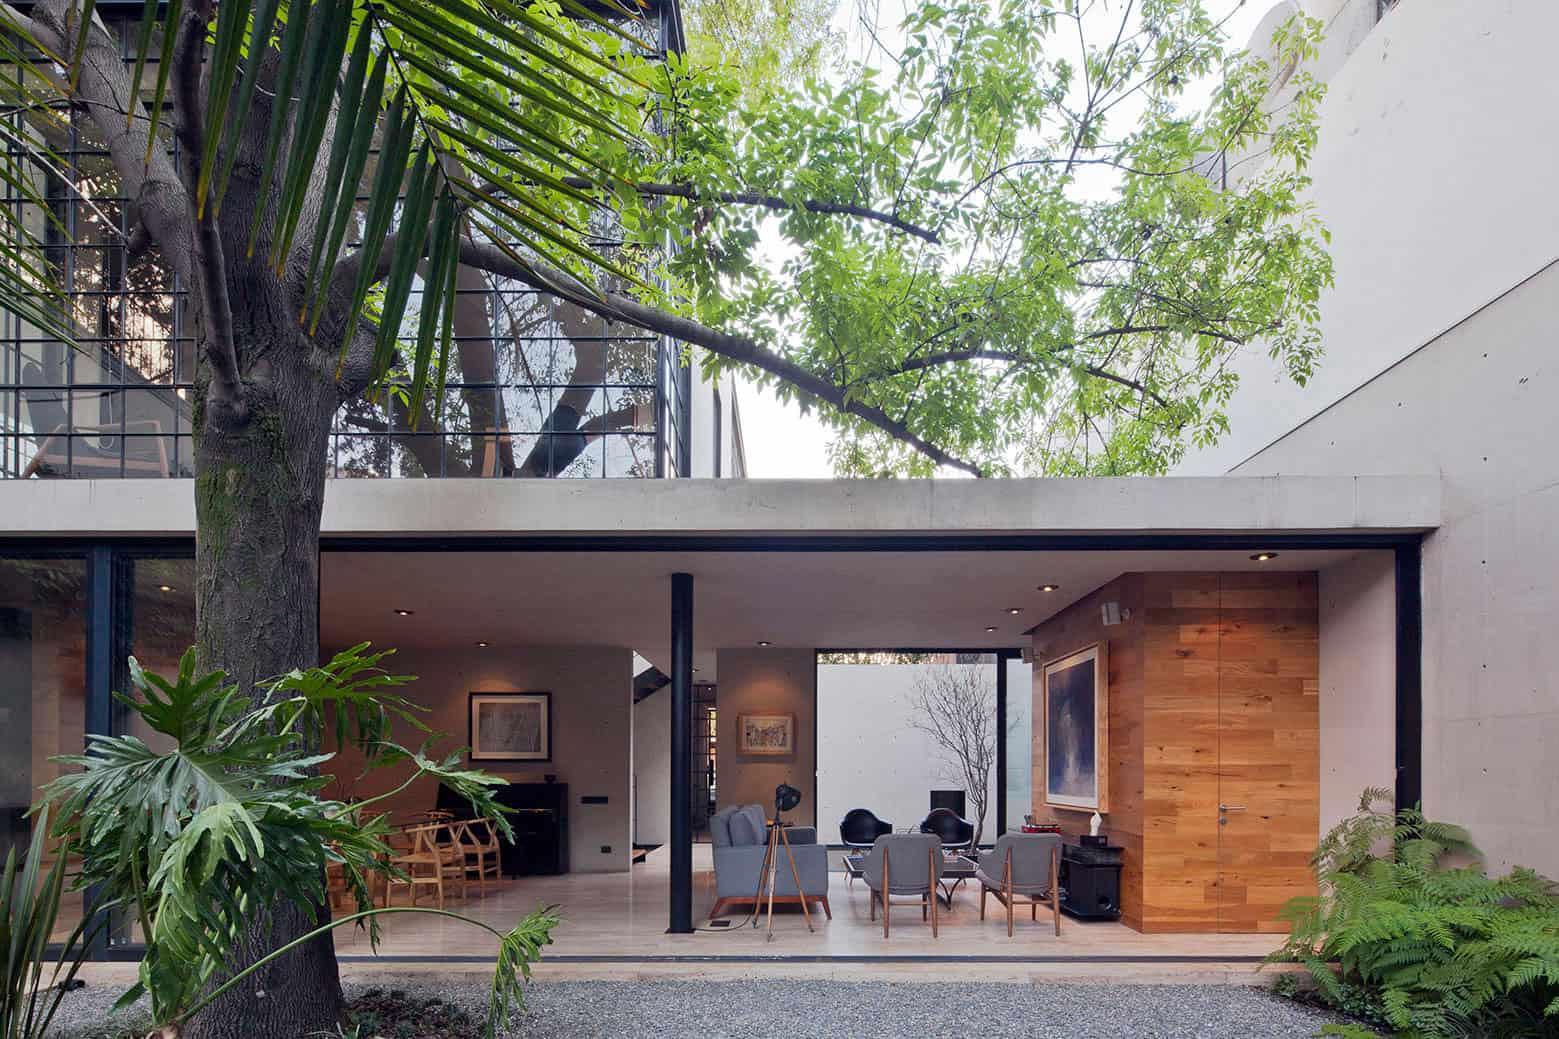 Warm Contemporary Home in Mexico City